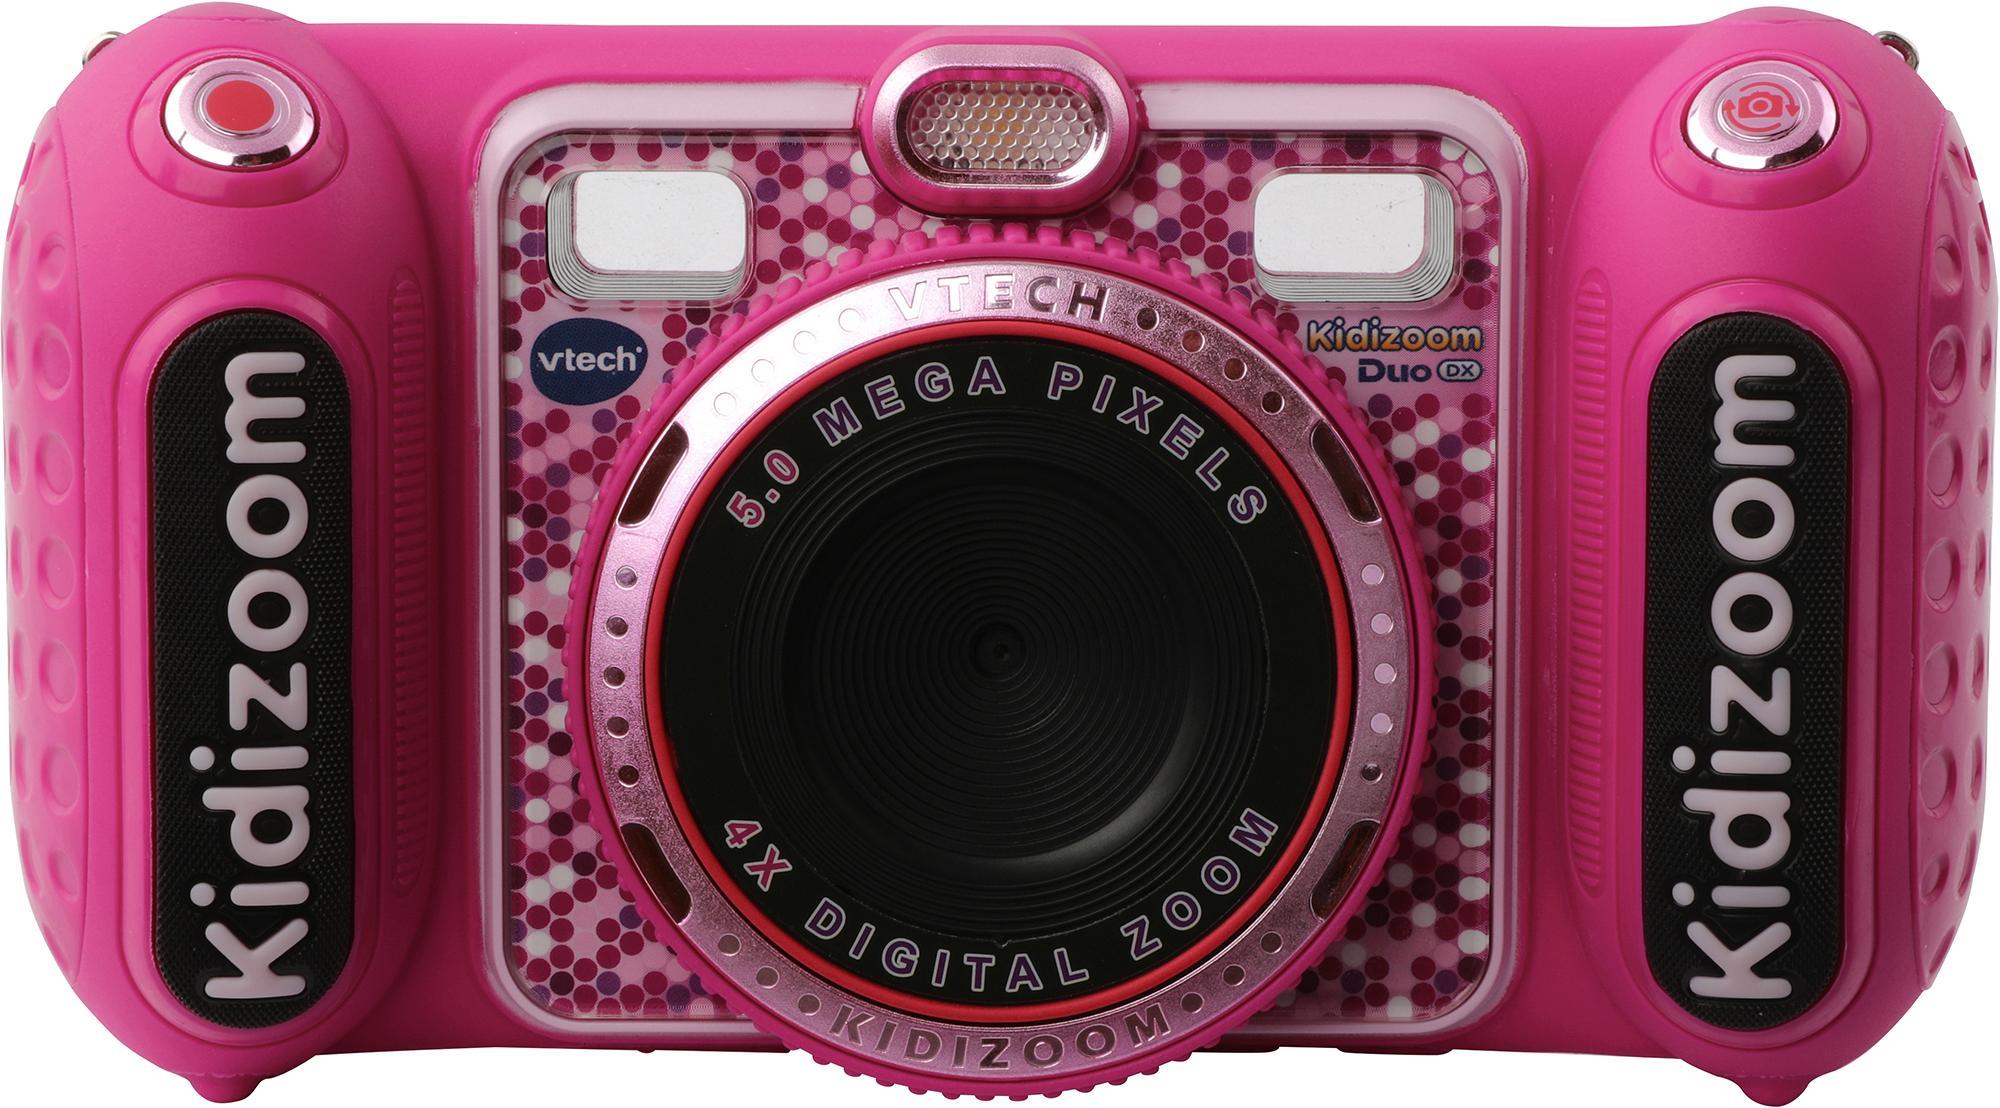 Vtech Kidizoom Duo DX pink Kinderkamera (5 MP) Kindermode/Spielzeug/Lernspielzeug/Kinder-Computer